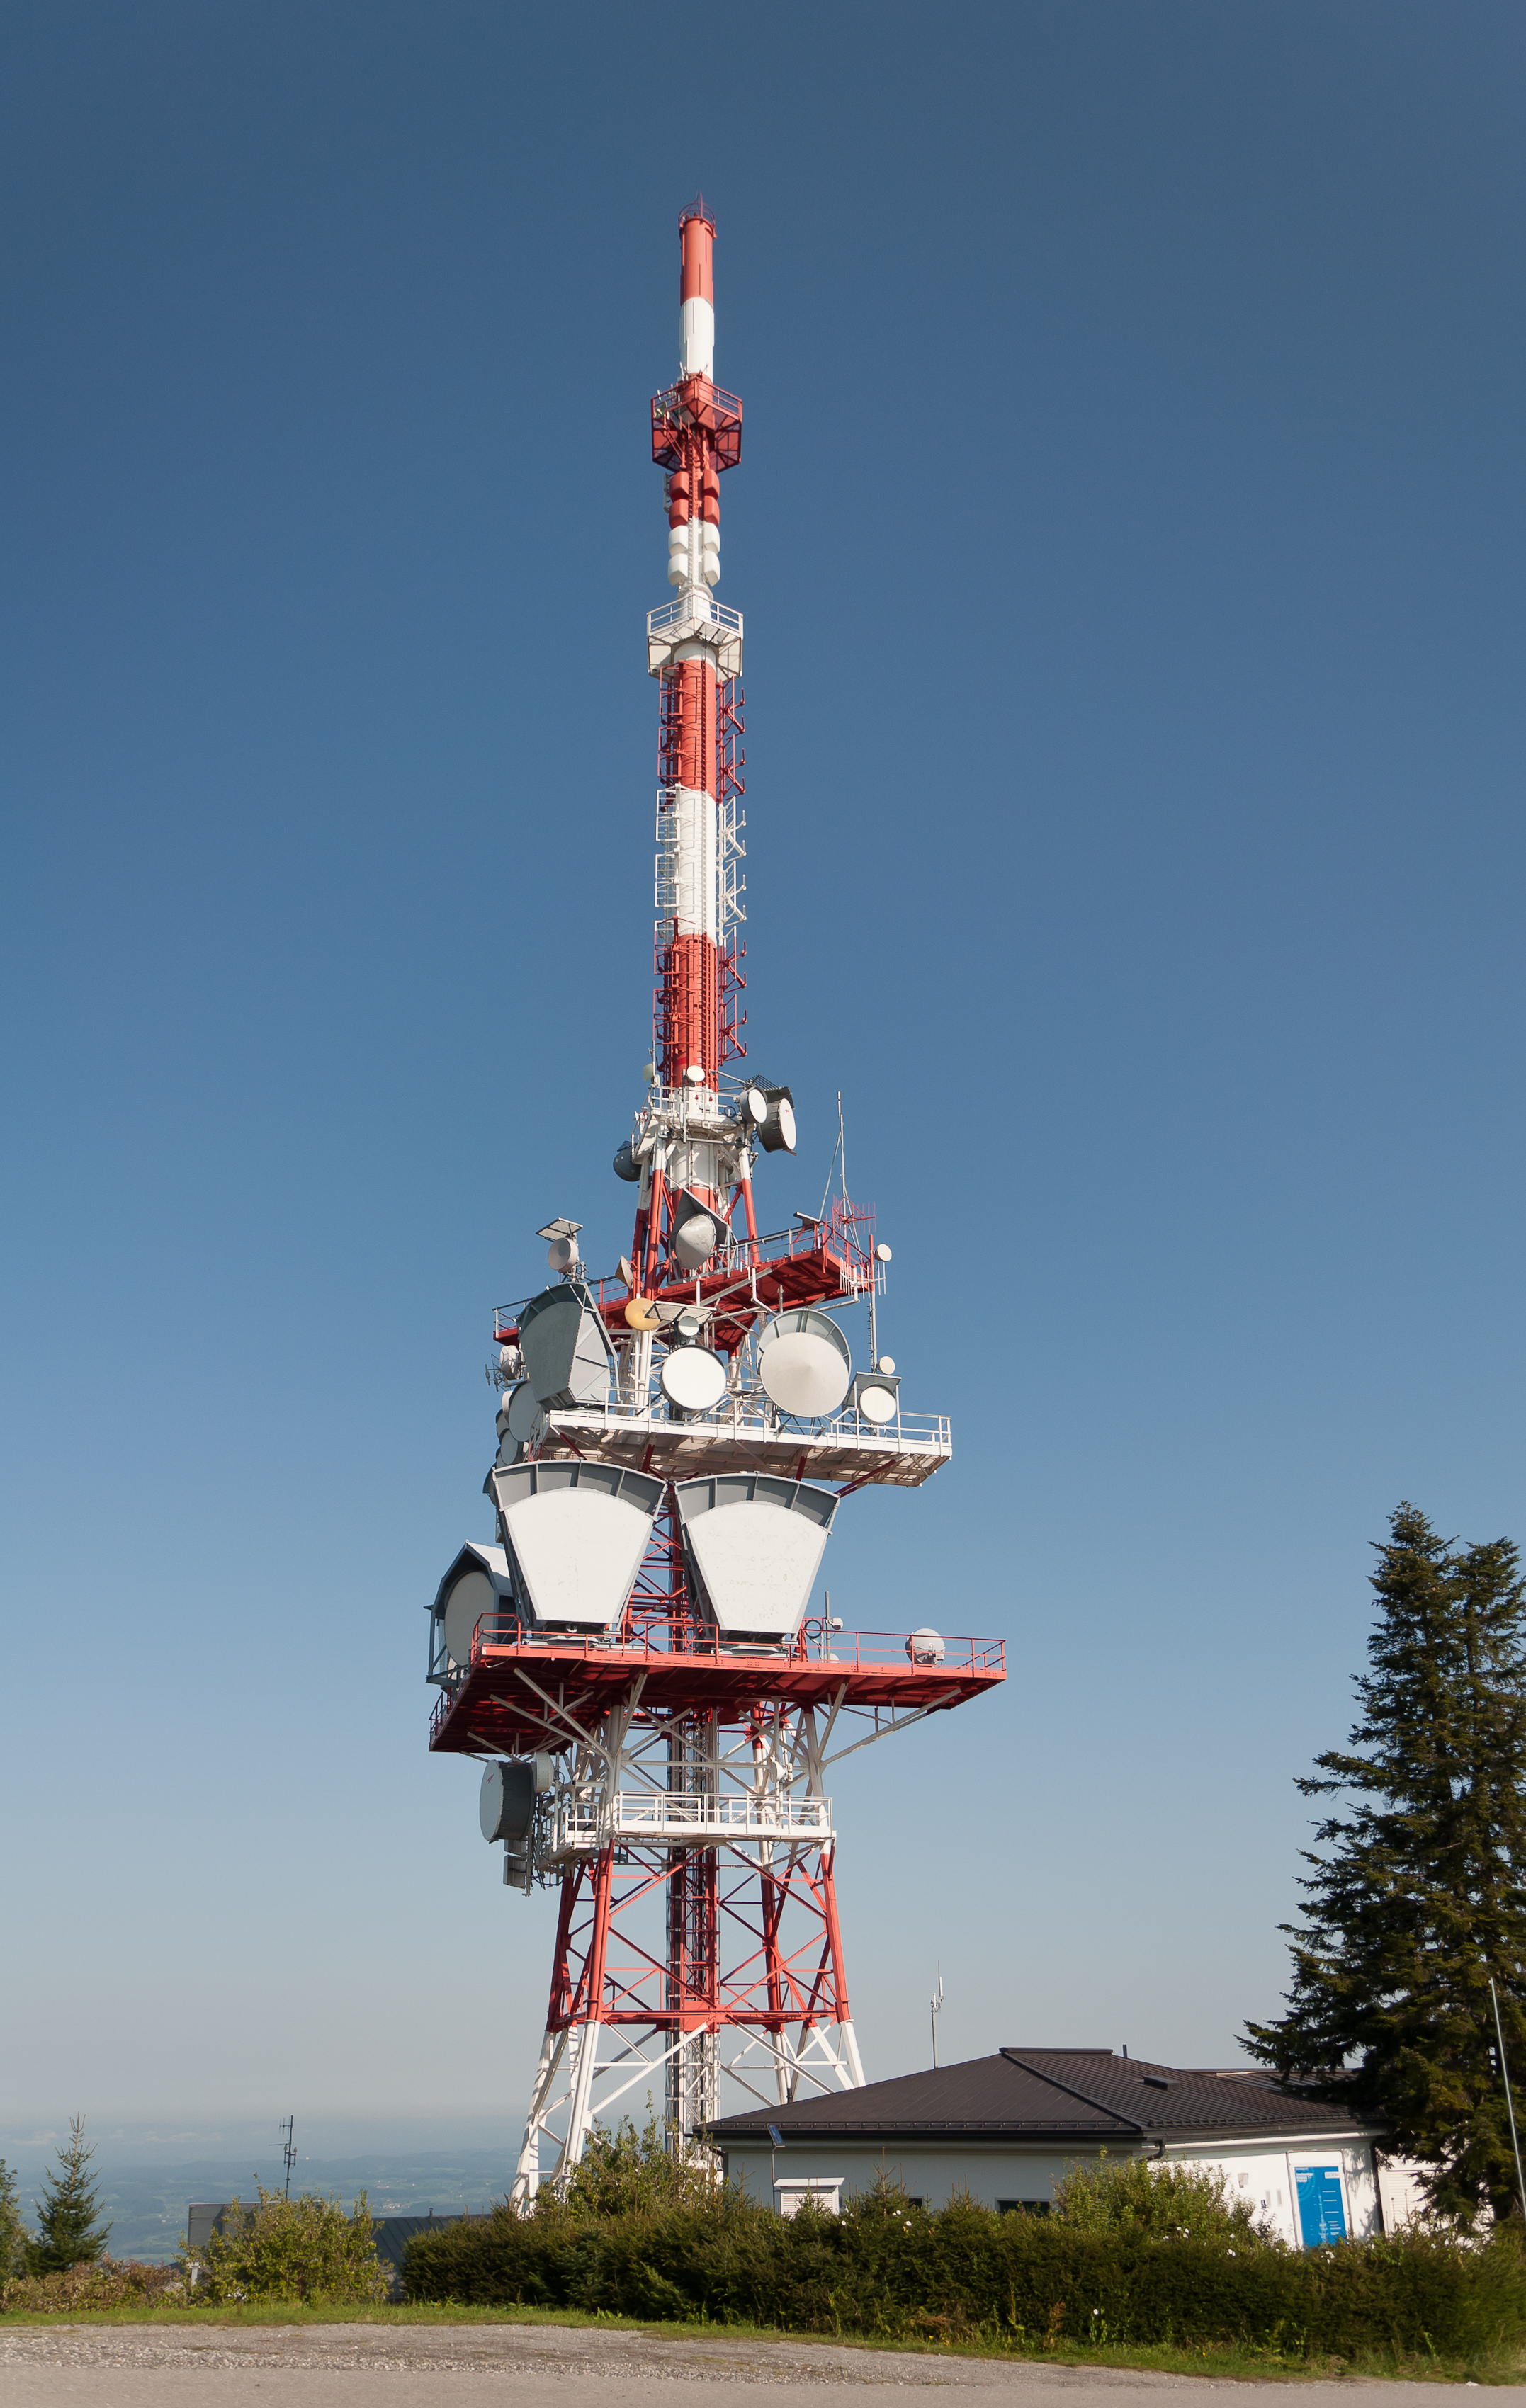 File:Pfänder radio tower jpg - Wikimedia Commons